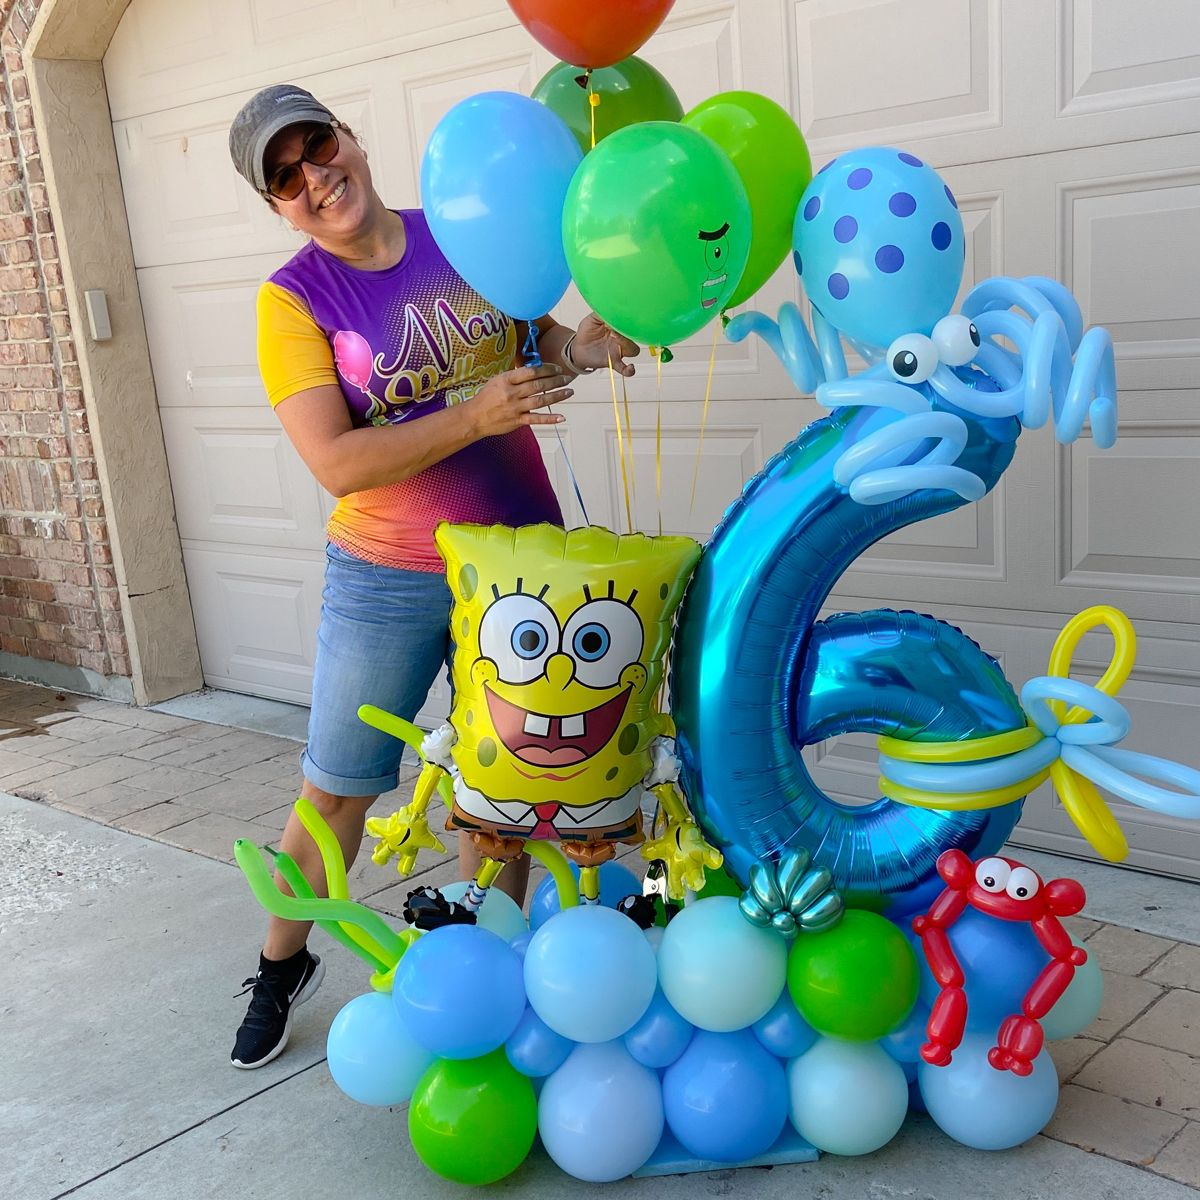 Spongebob Squarepants Birthday Balloons DIY KIT Party Supplies Balloons Spongebob Arch Balloon Party Decor Cake Table Gift Table